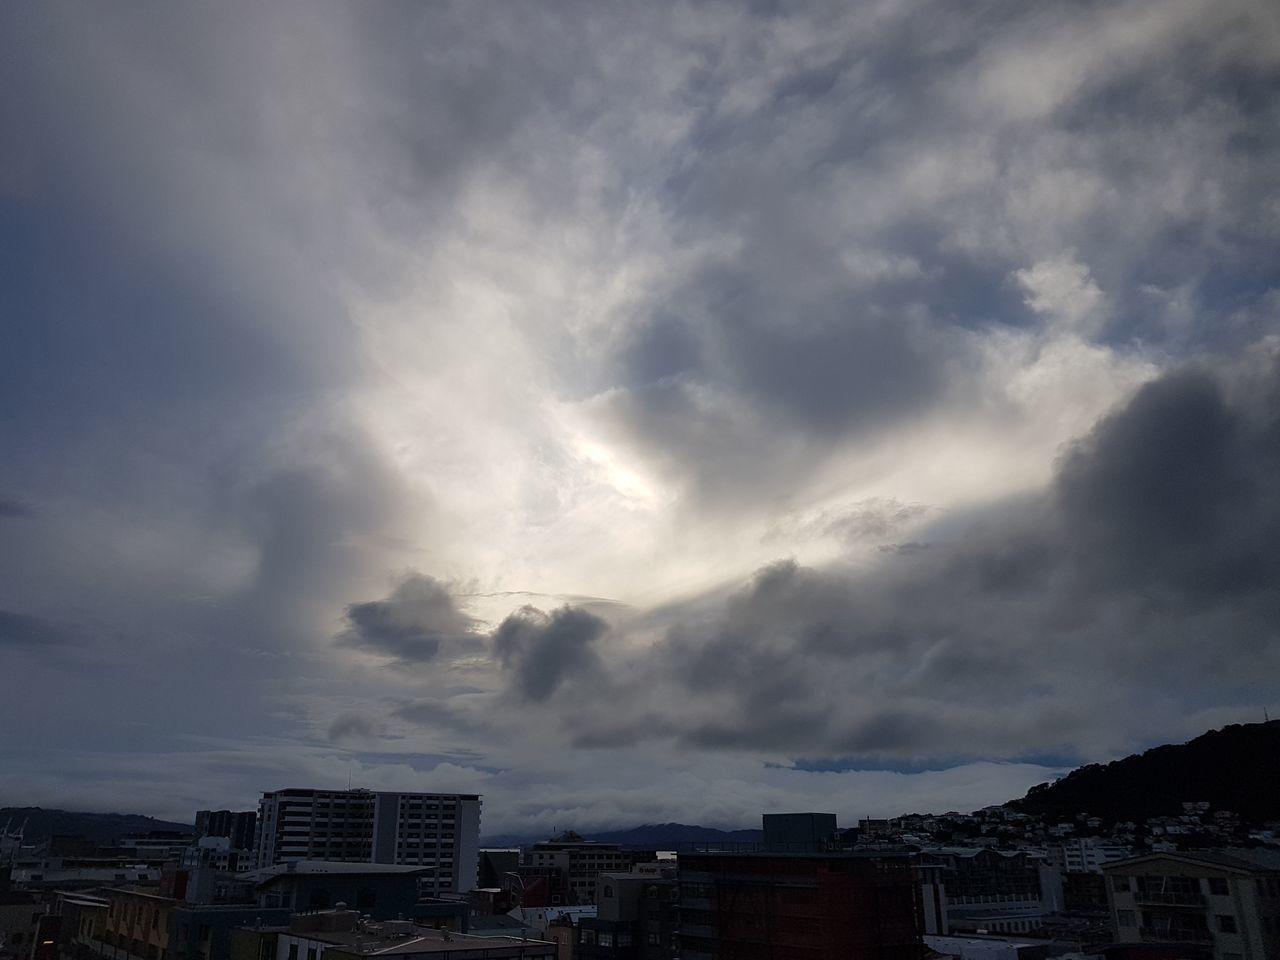 Early morning sky over Wellington. Dramatic Sky Cloud - Sky Cityscape Outdoors Sky City Storm Cloud Urban Skyline Newzealand NZ Sunlight New Zealand Asis NoEditNoFilter Wellington Nz